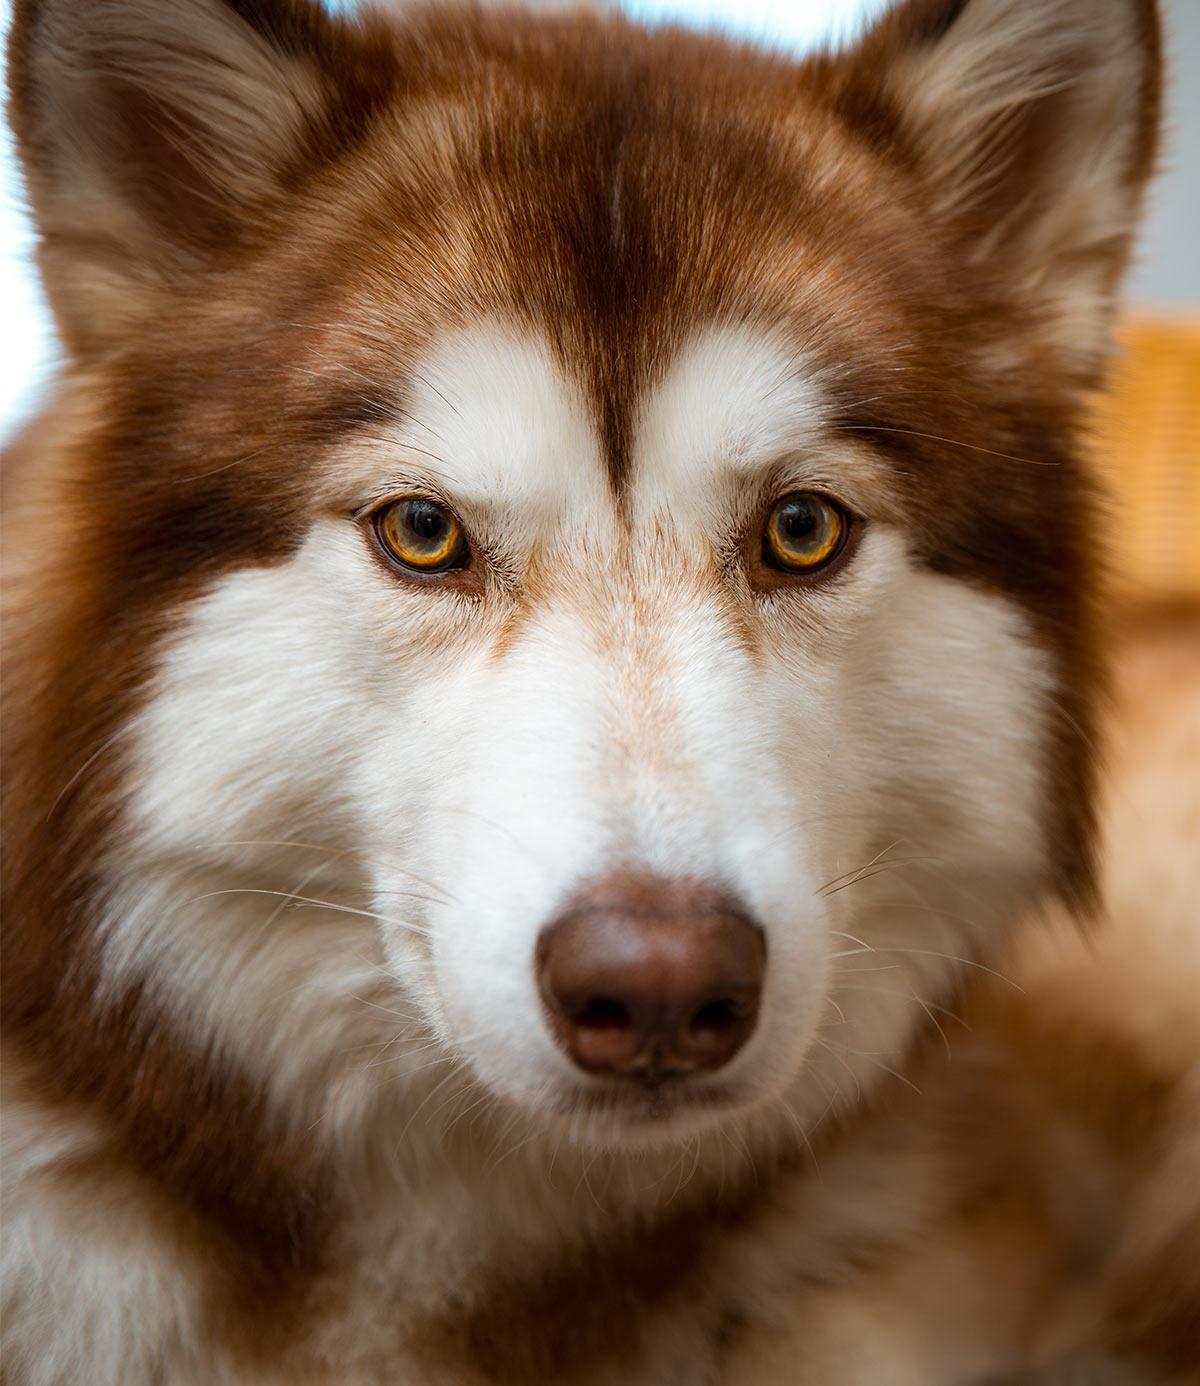 Pictures of Huskies